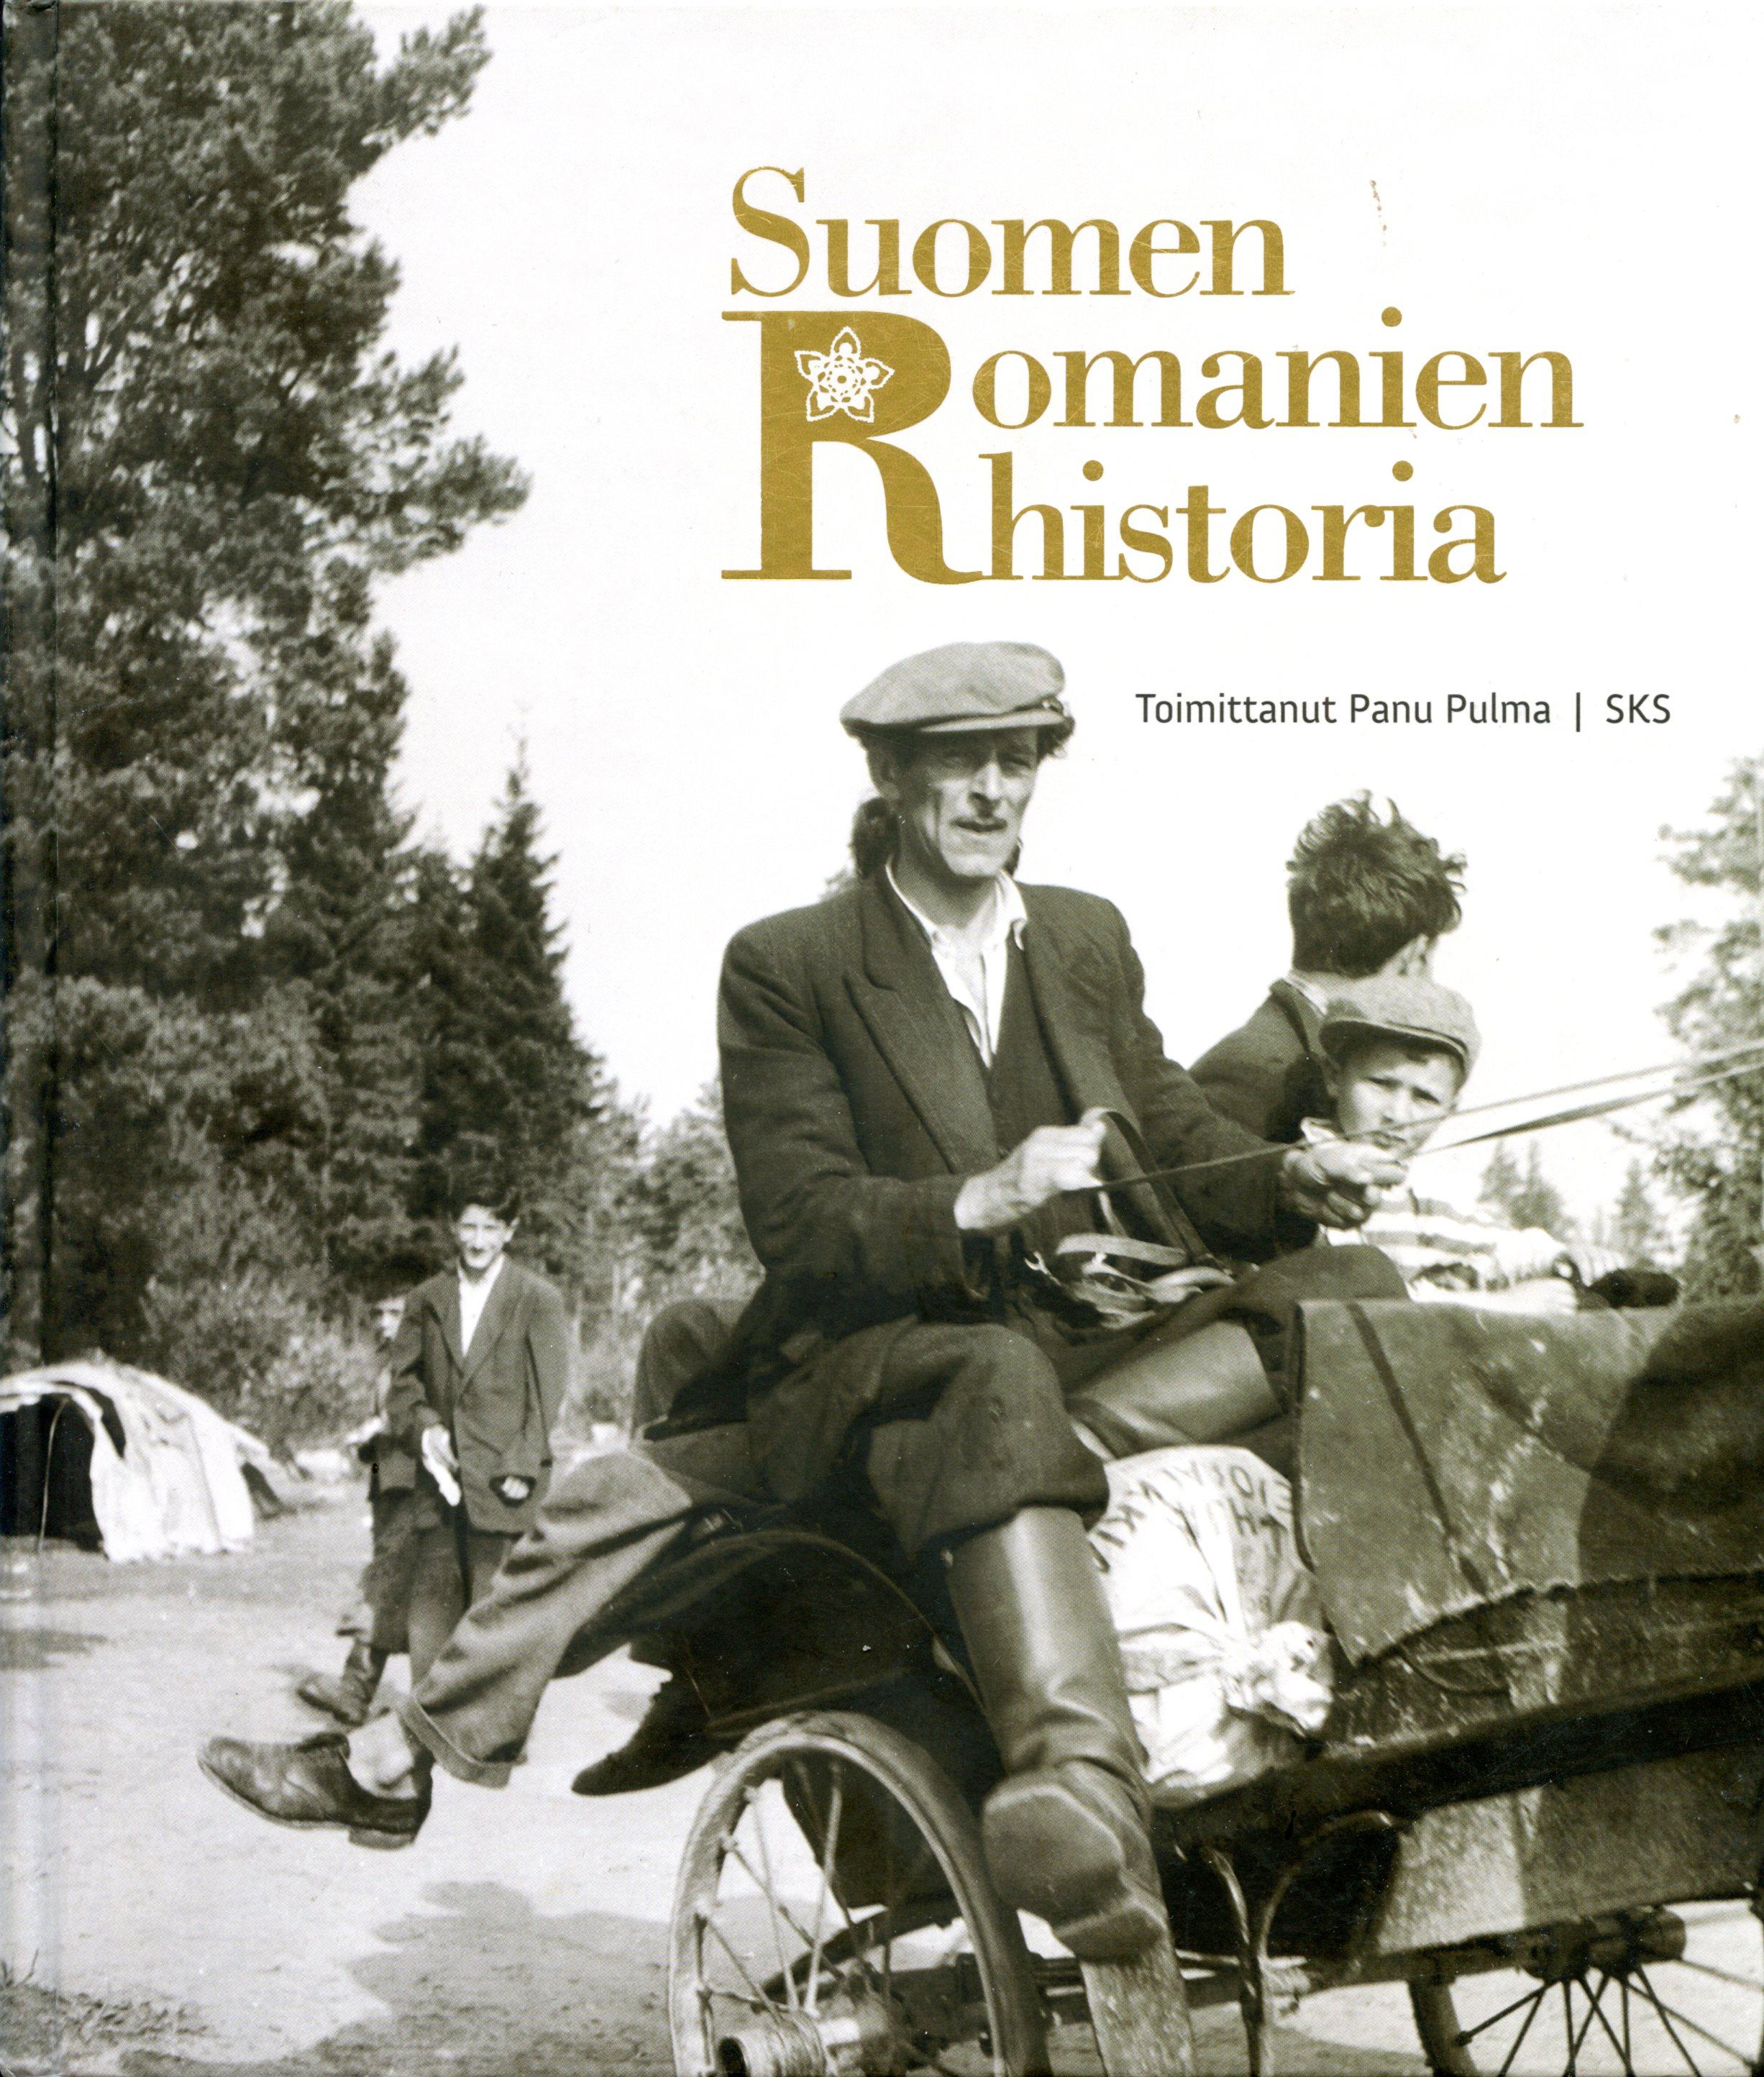 Suomen romanien historia. Toim. Panu Pulma. SKS 2012.